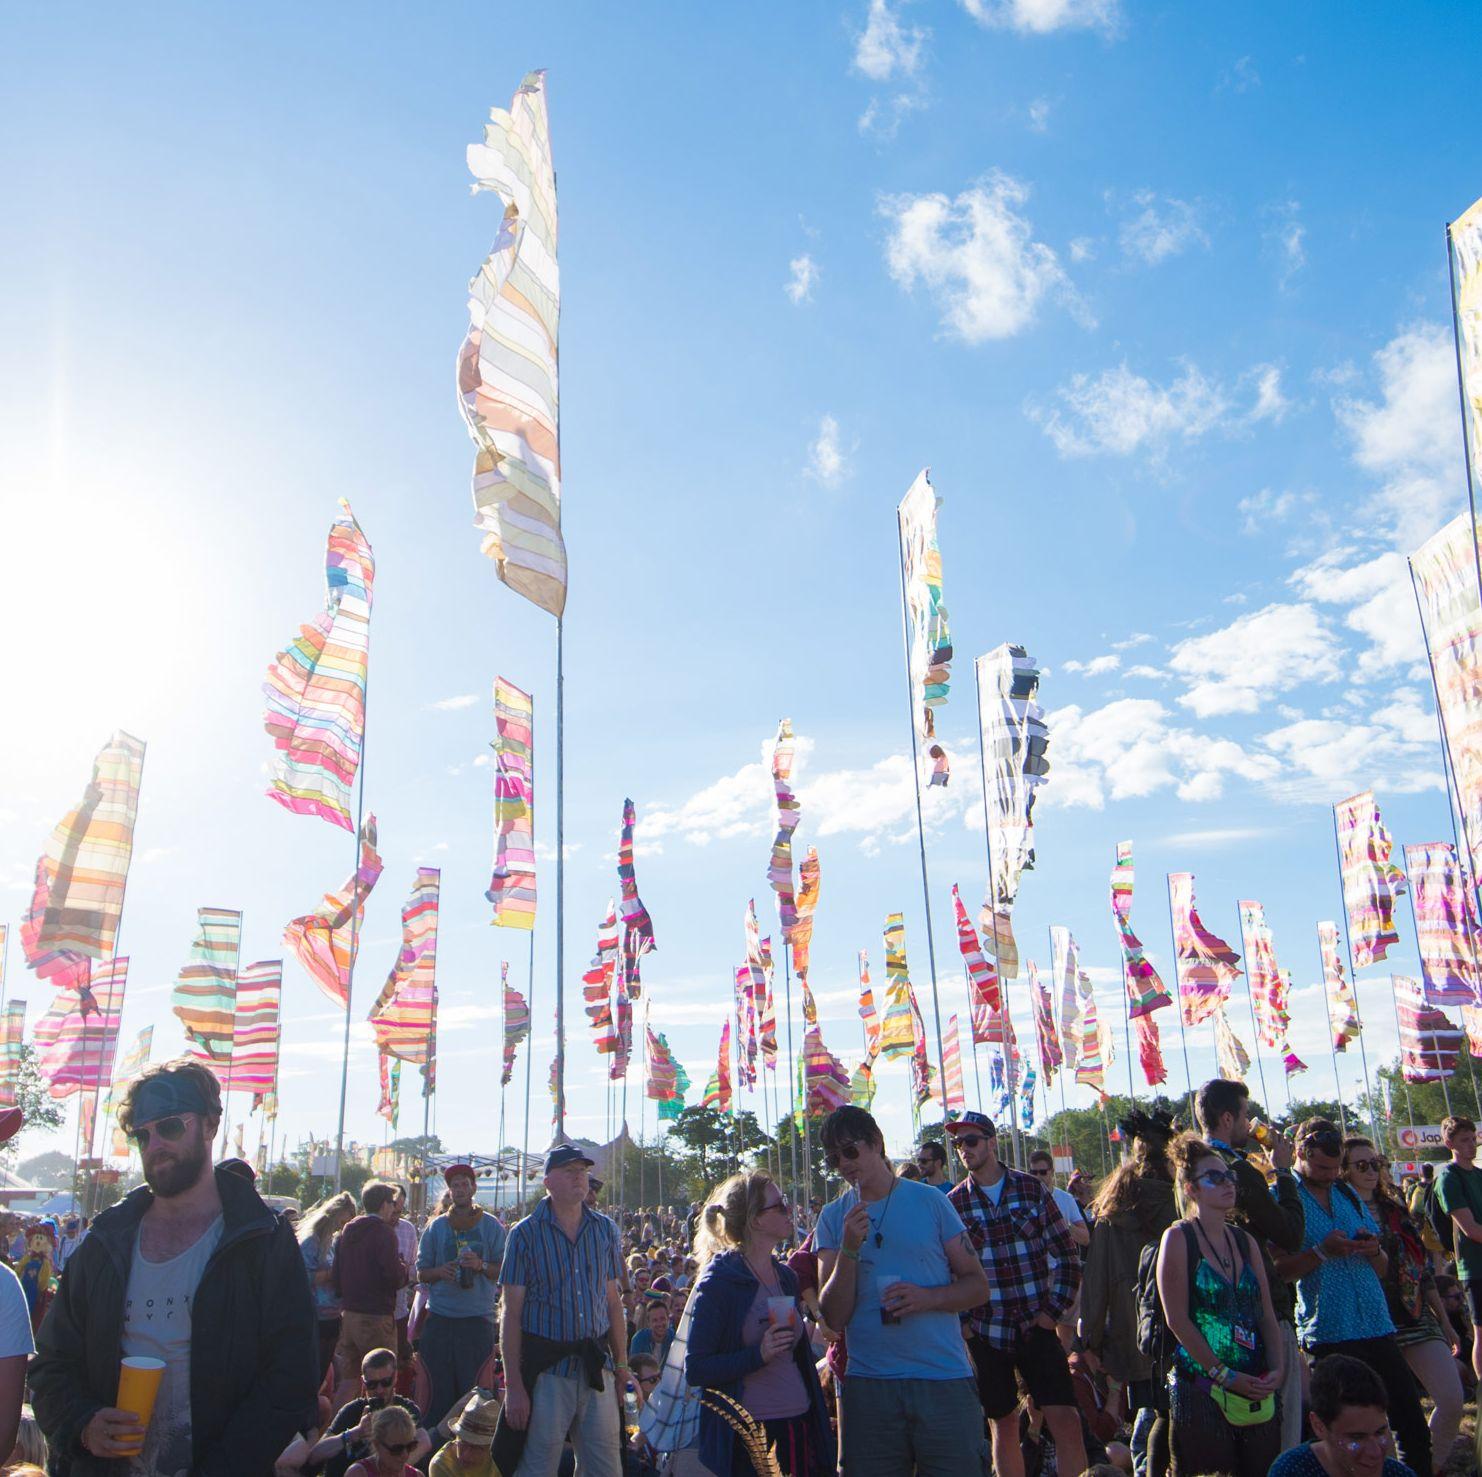 Festivals 2019: Best UK music festivals guide - Glastonbury, Wireless, Lovebox, Reading and Leeds and more